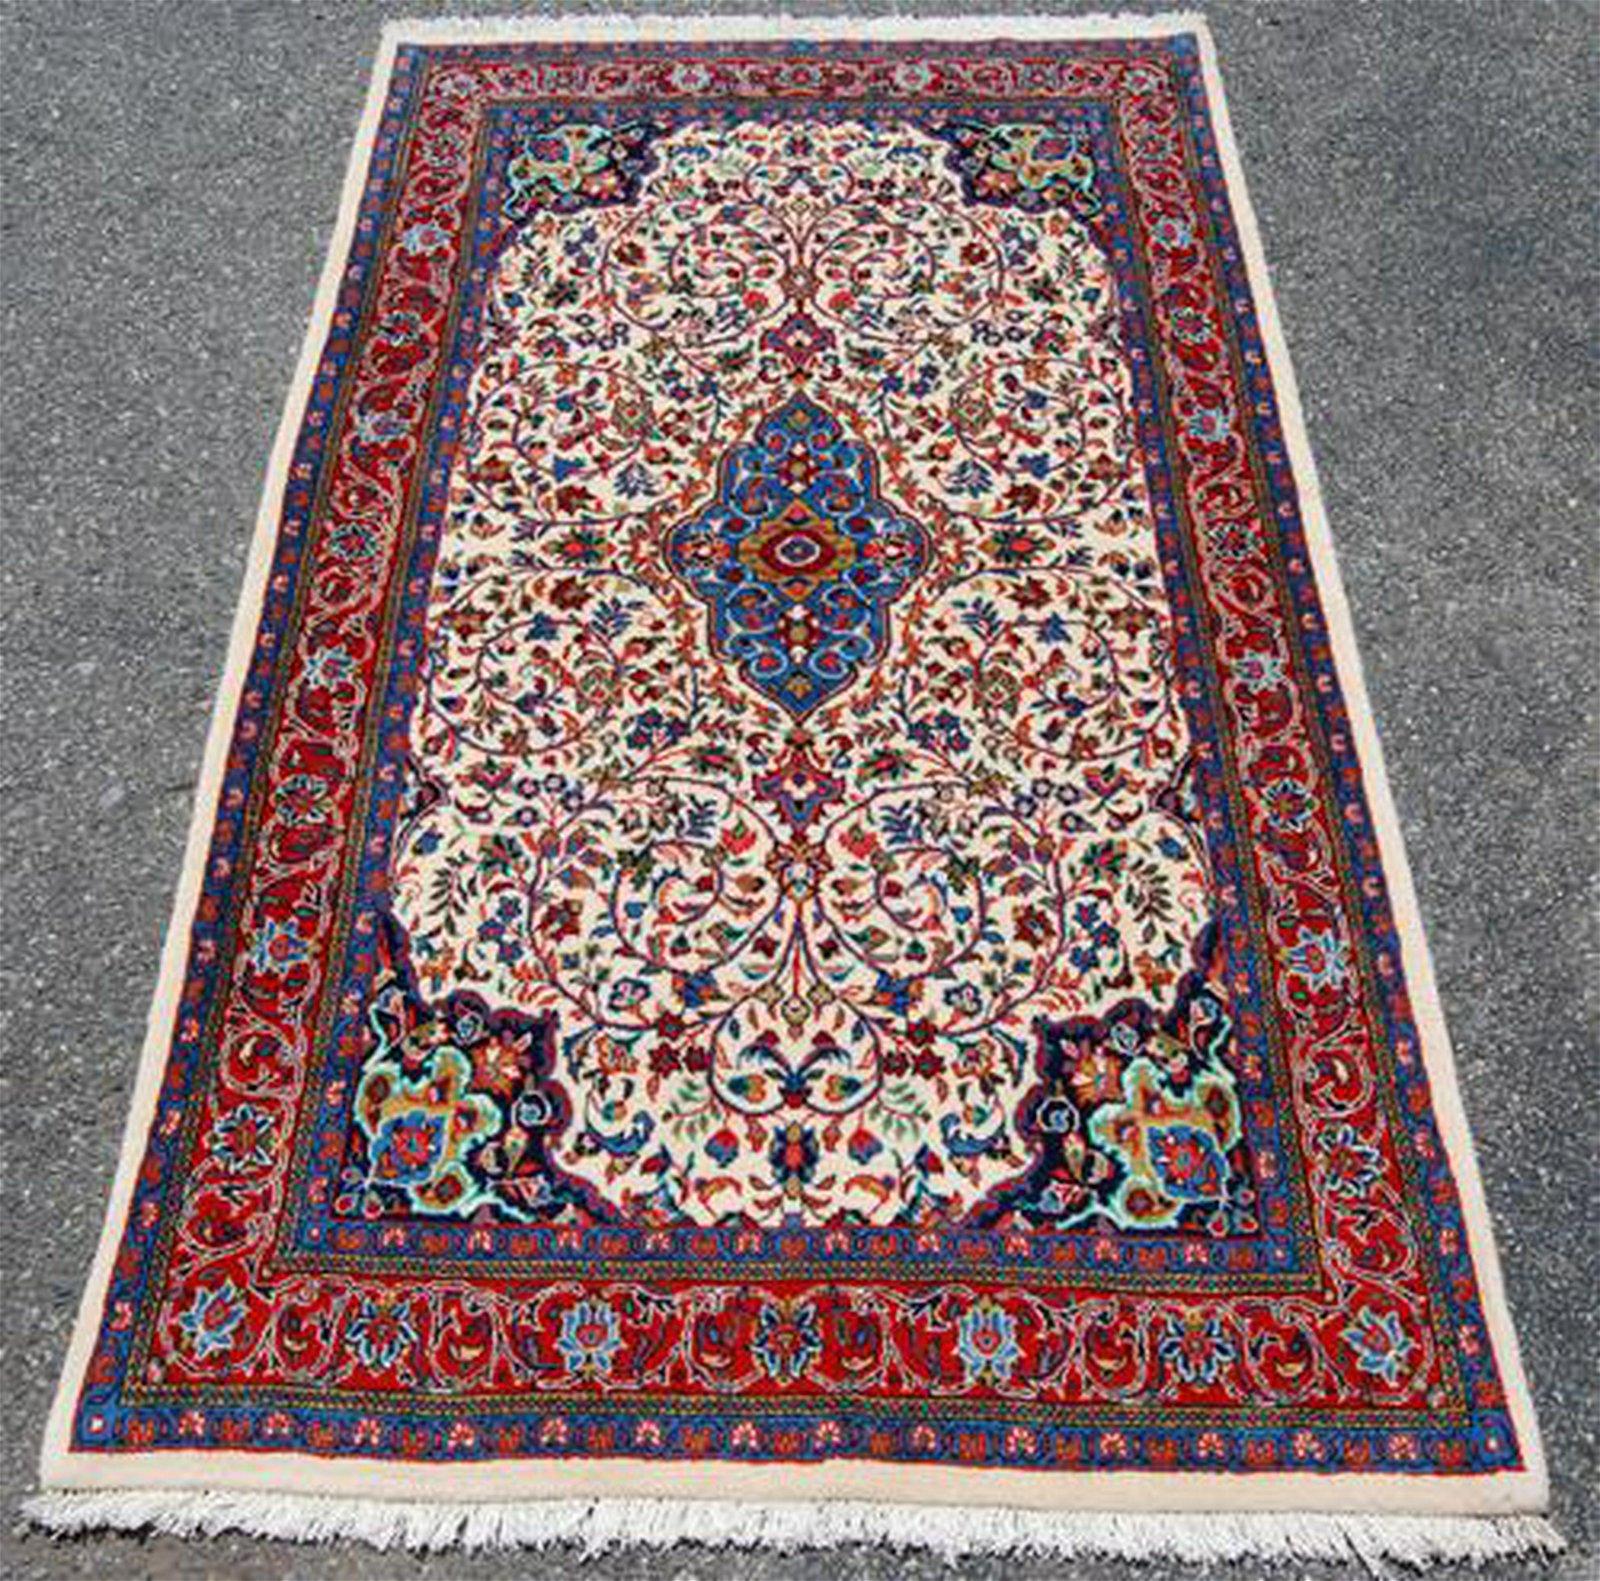 Vibrant Hand Woven Authentic Persian Sarouk 7.3x4.3